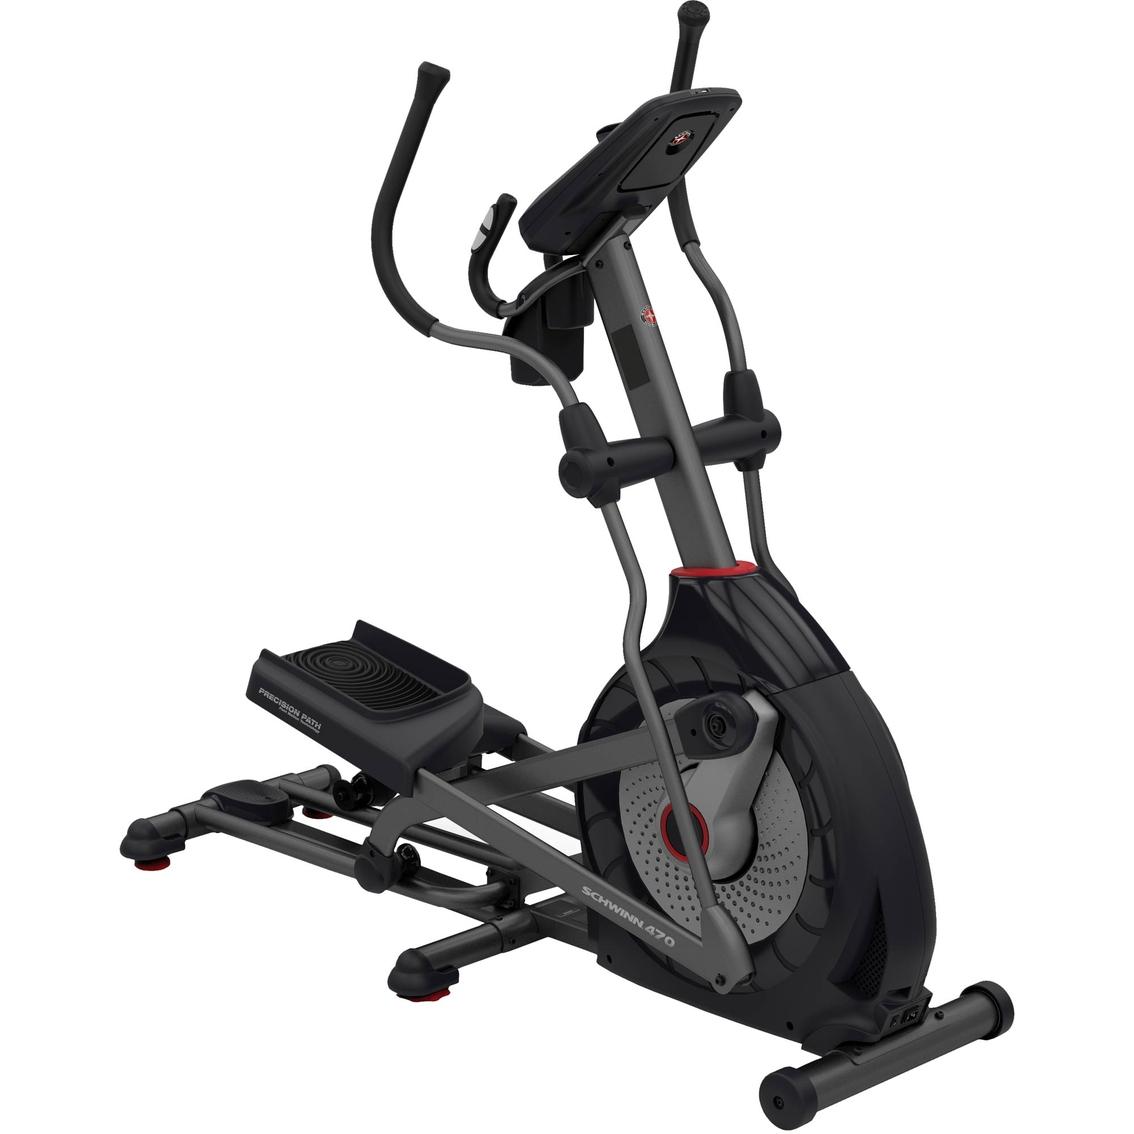 af1be4404f9 Schwinn 470 Elliptical | Cardio Equipment | Sports & Outdoors | Shop ...